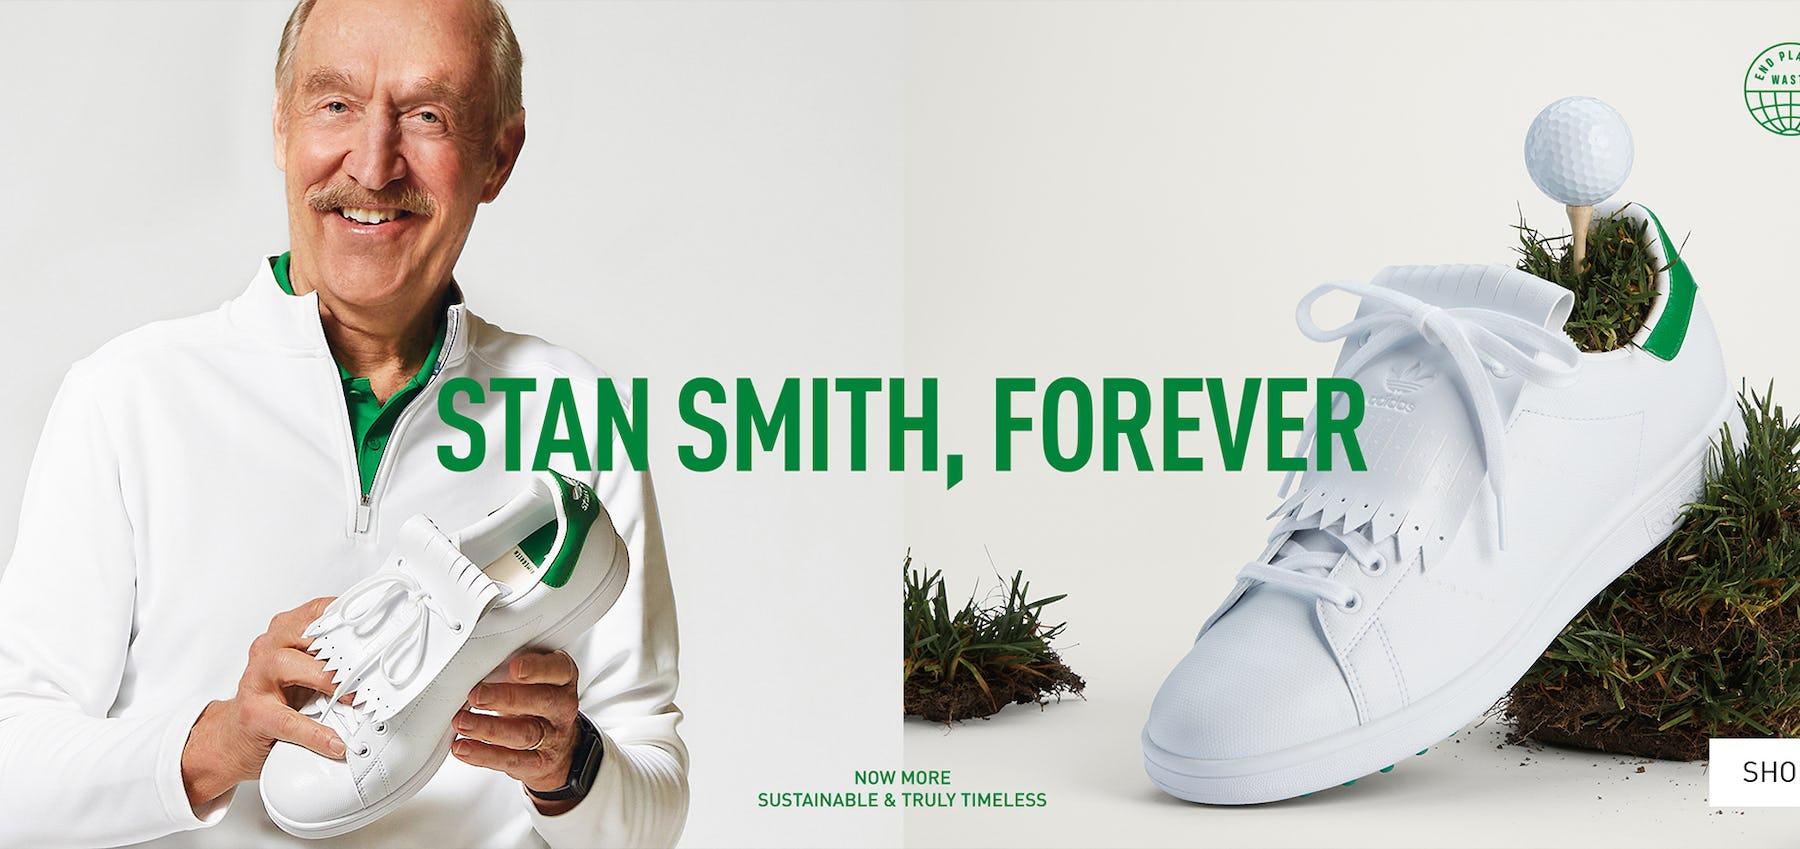 adidas Special Edition Stan Smith Golf Shoe